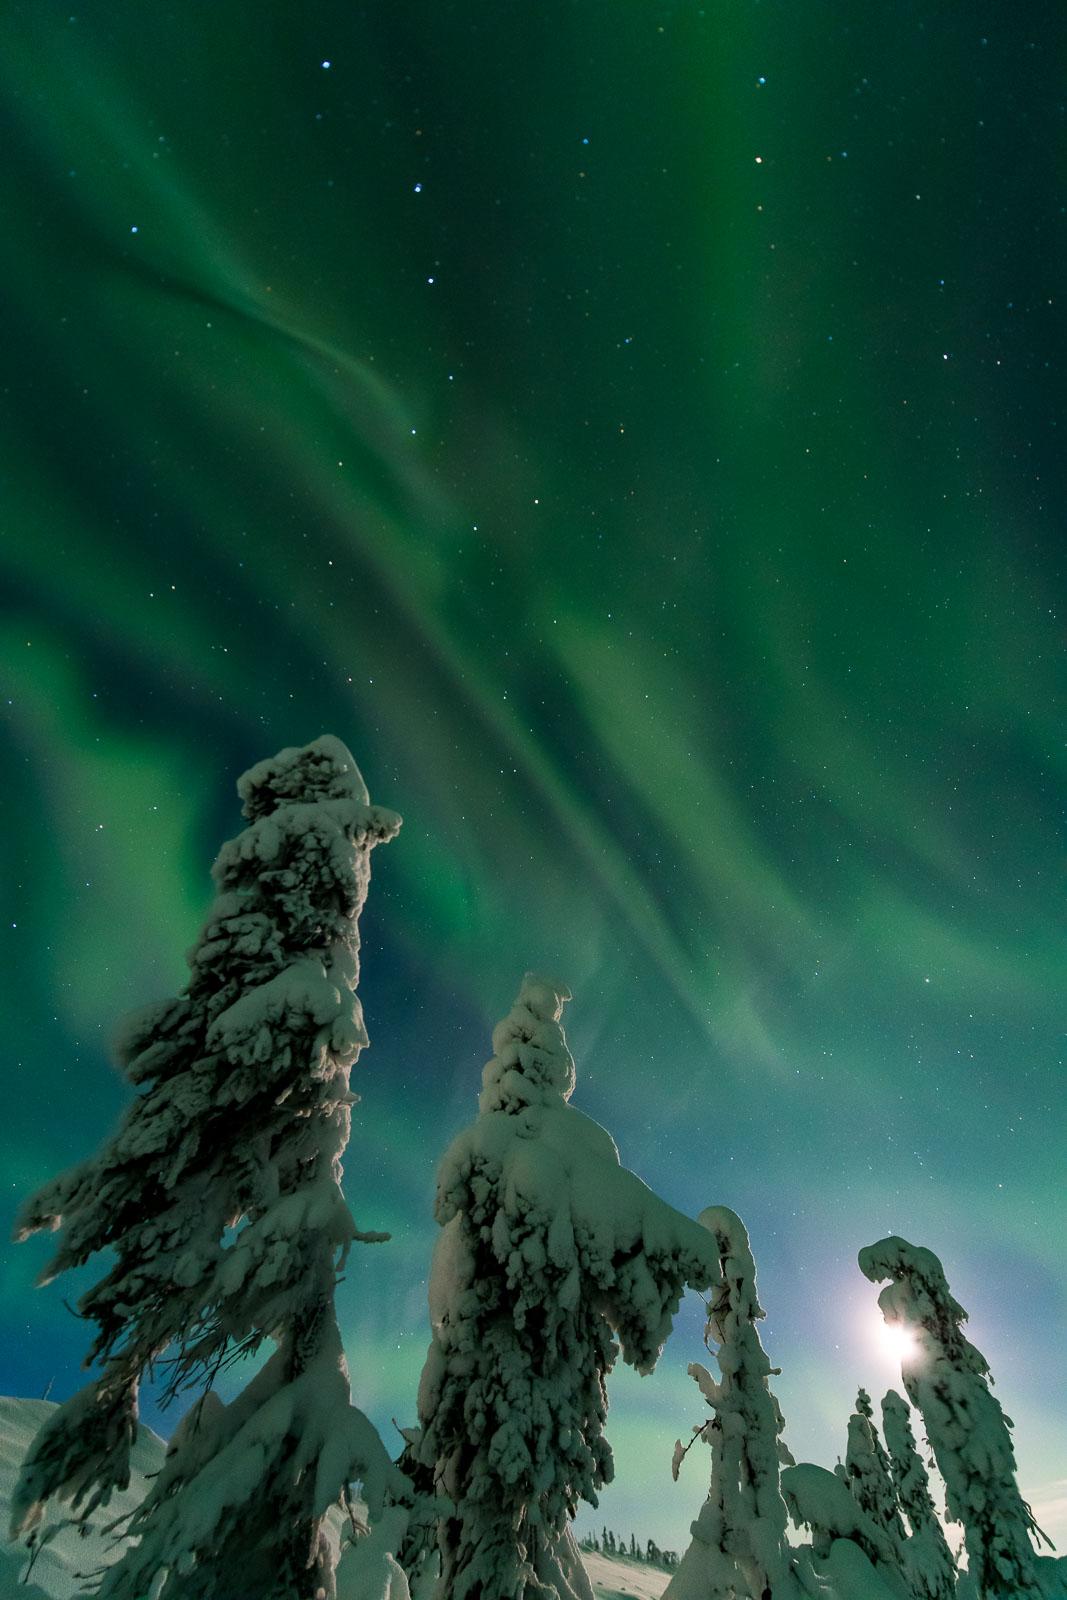 The aurora borealis floats over snowy trees along the Dalton Highway.